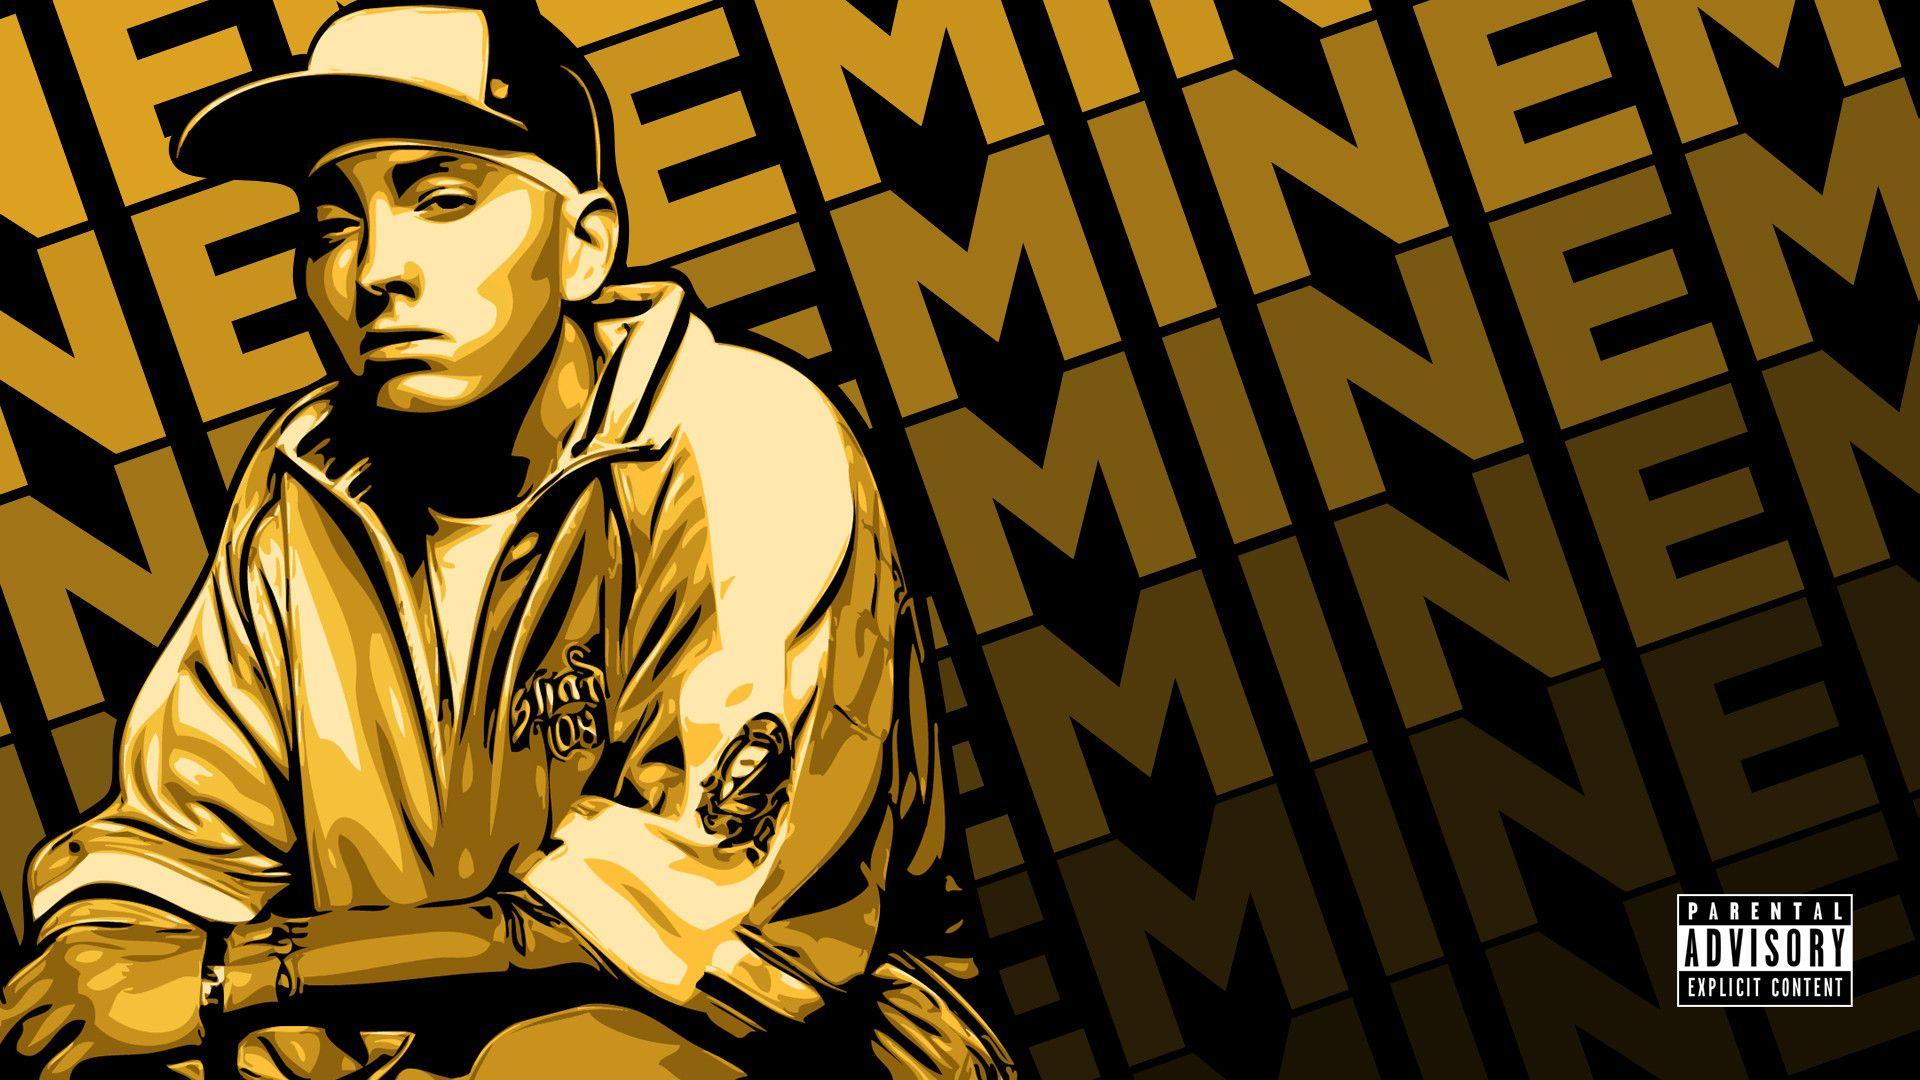 Eminem-HD-wallpaper-wp3805060